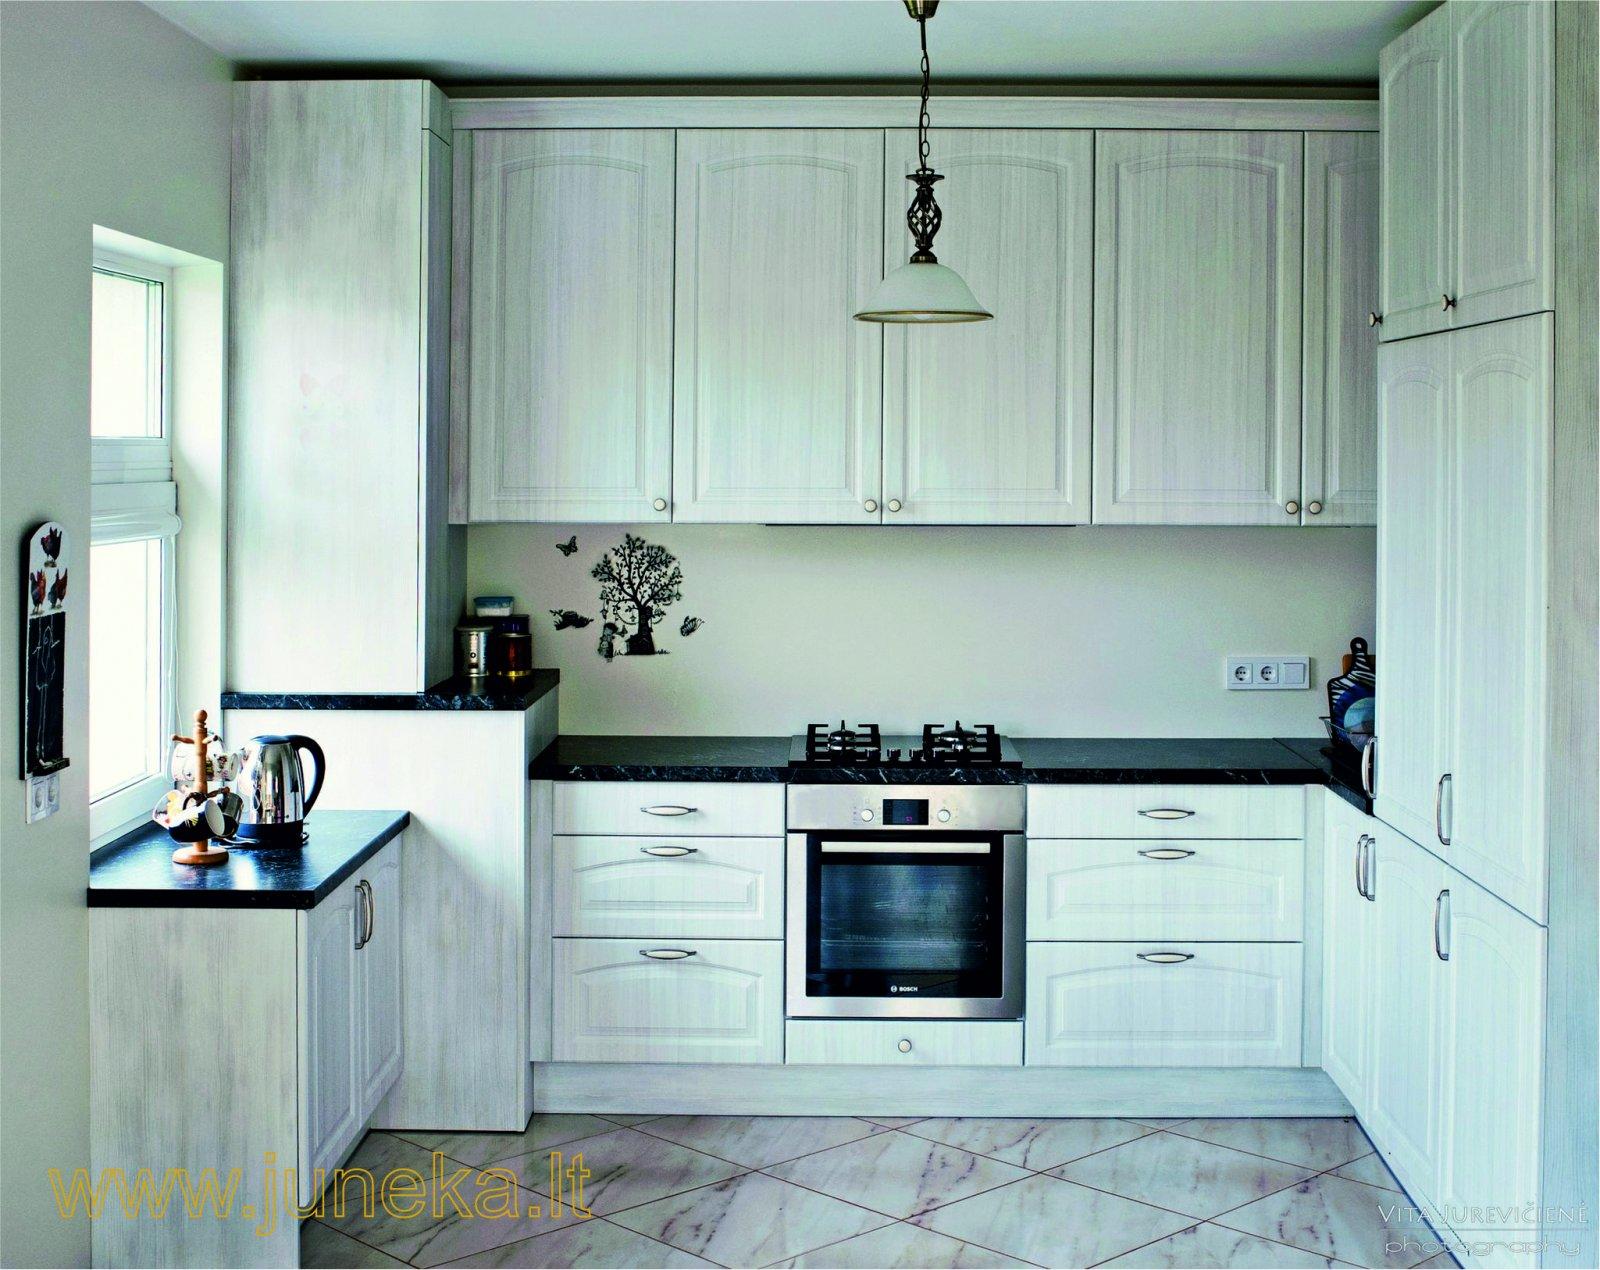 Virtuve A1.jpg